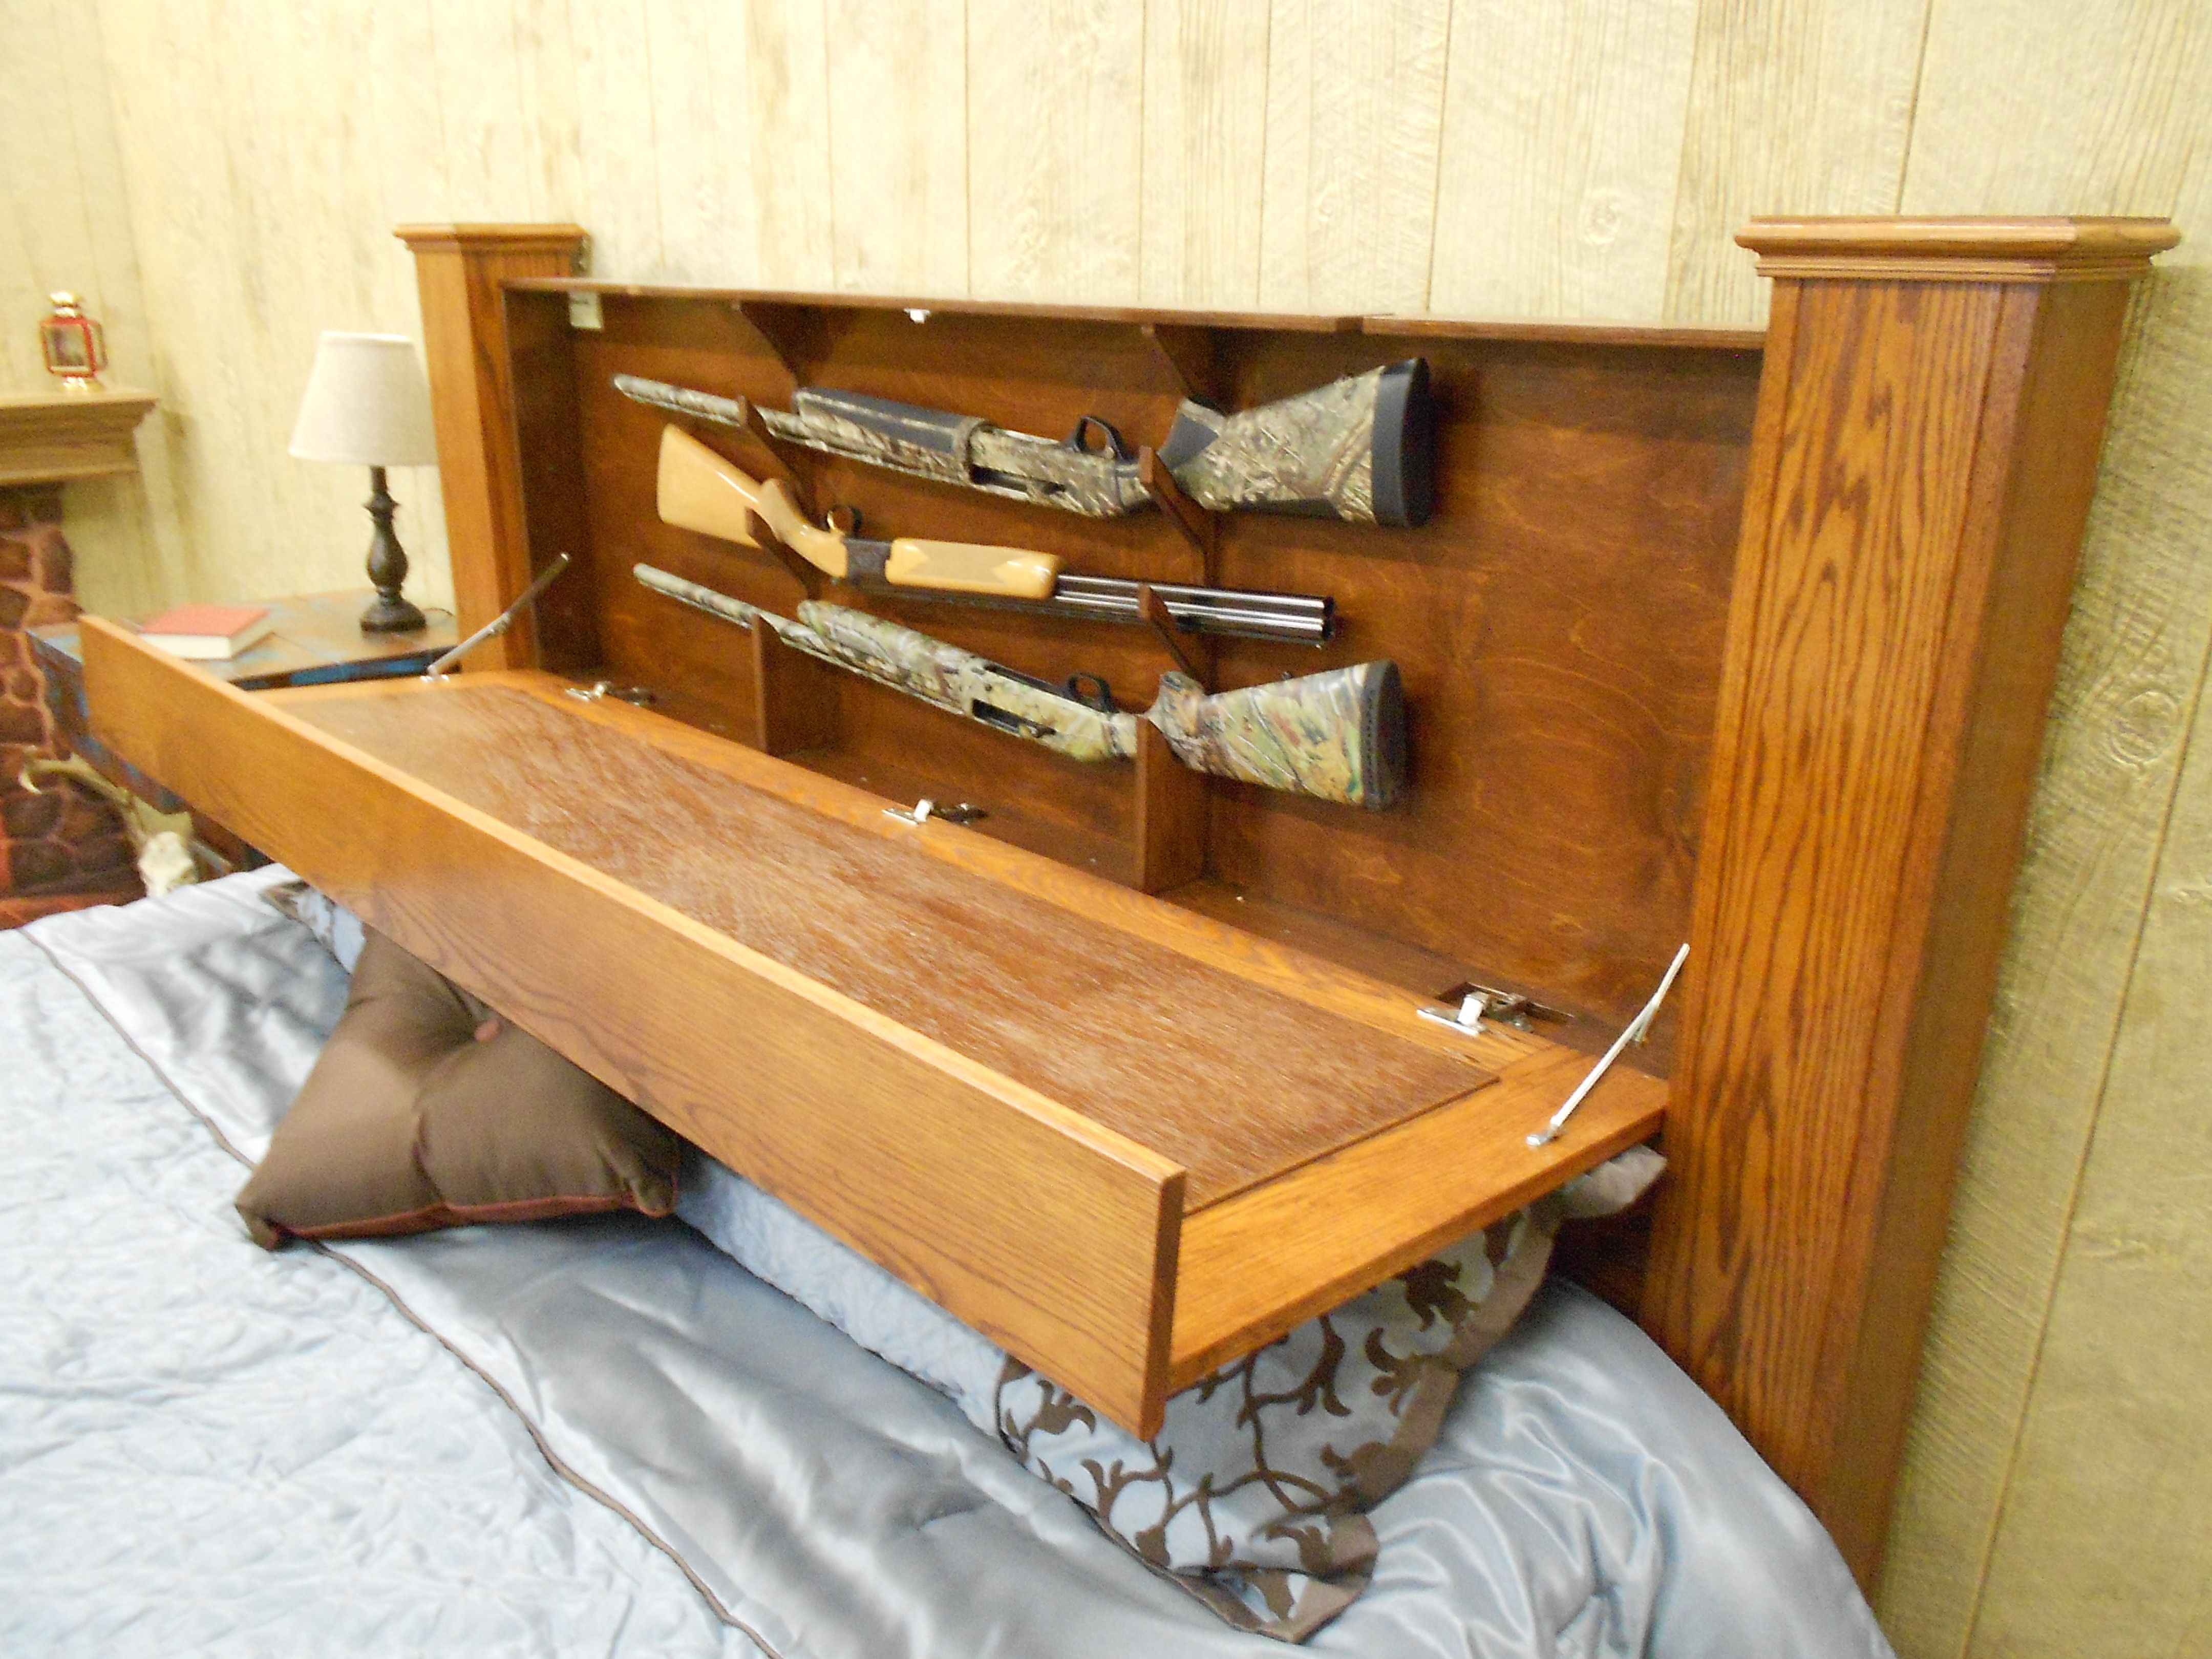 Concealed Storage King Size Bed By LCSI Concealed Storage